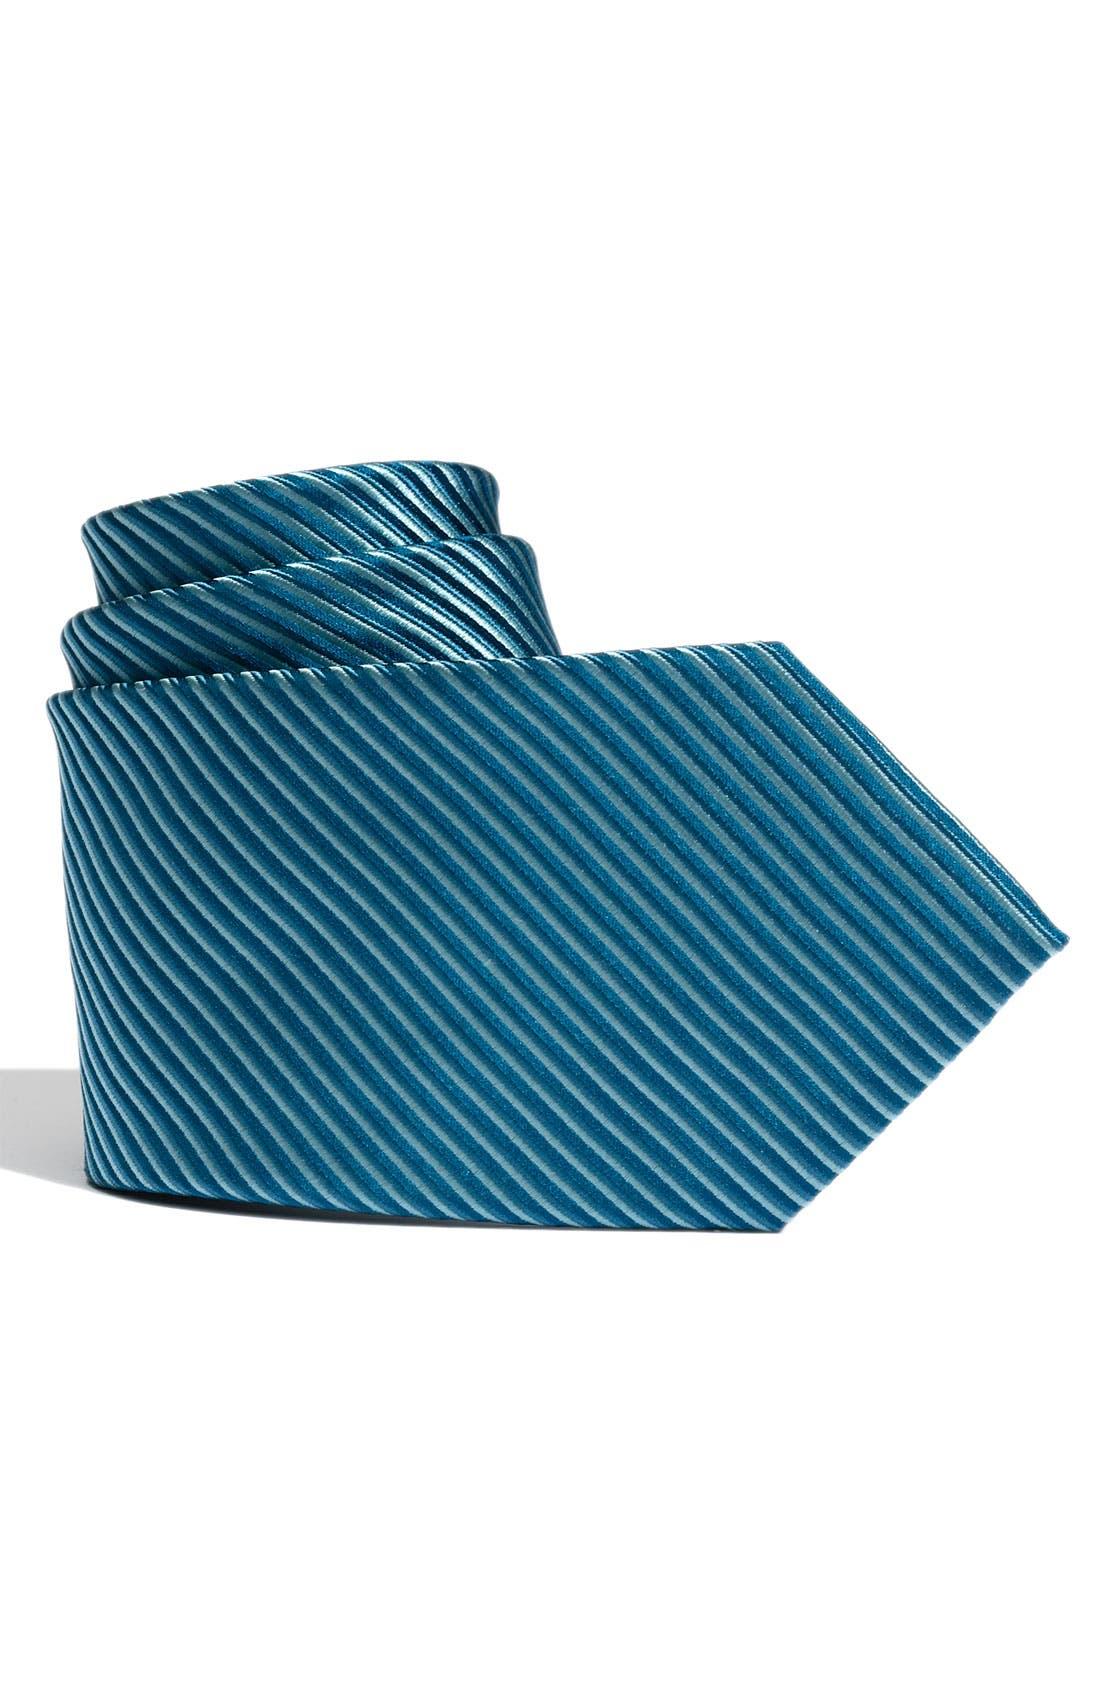 Alternate Image 1 Selected - Nordstrom Stripe Tie (Big Boys)